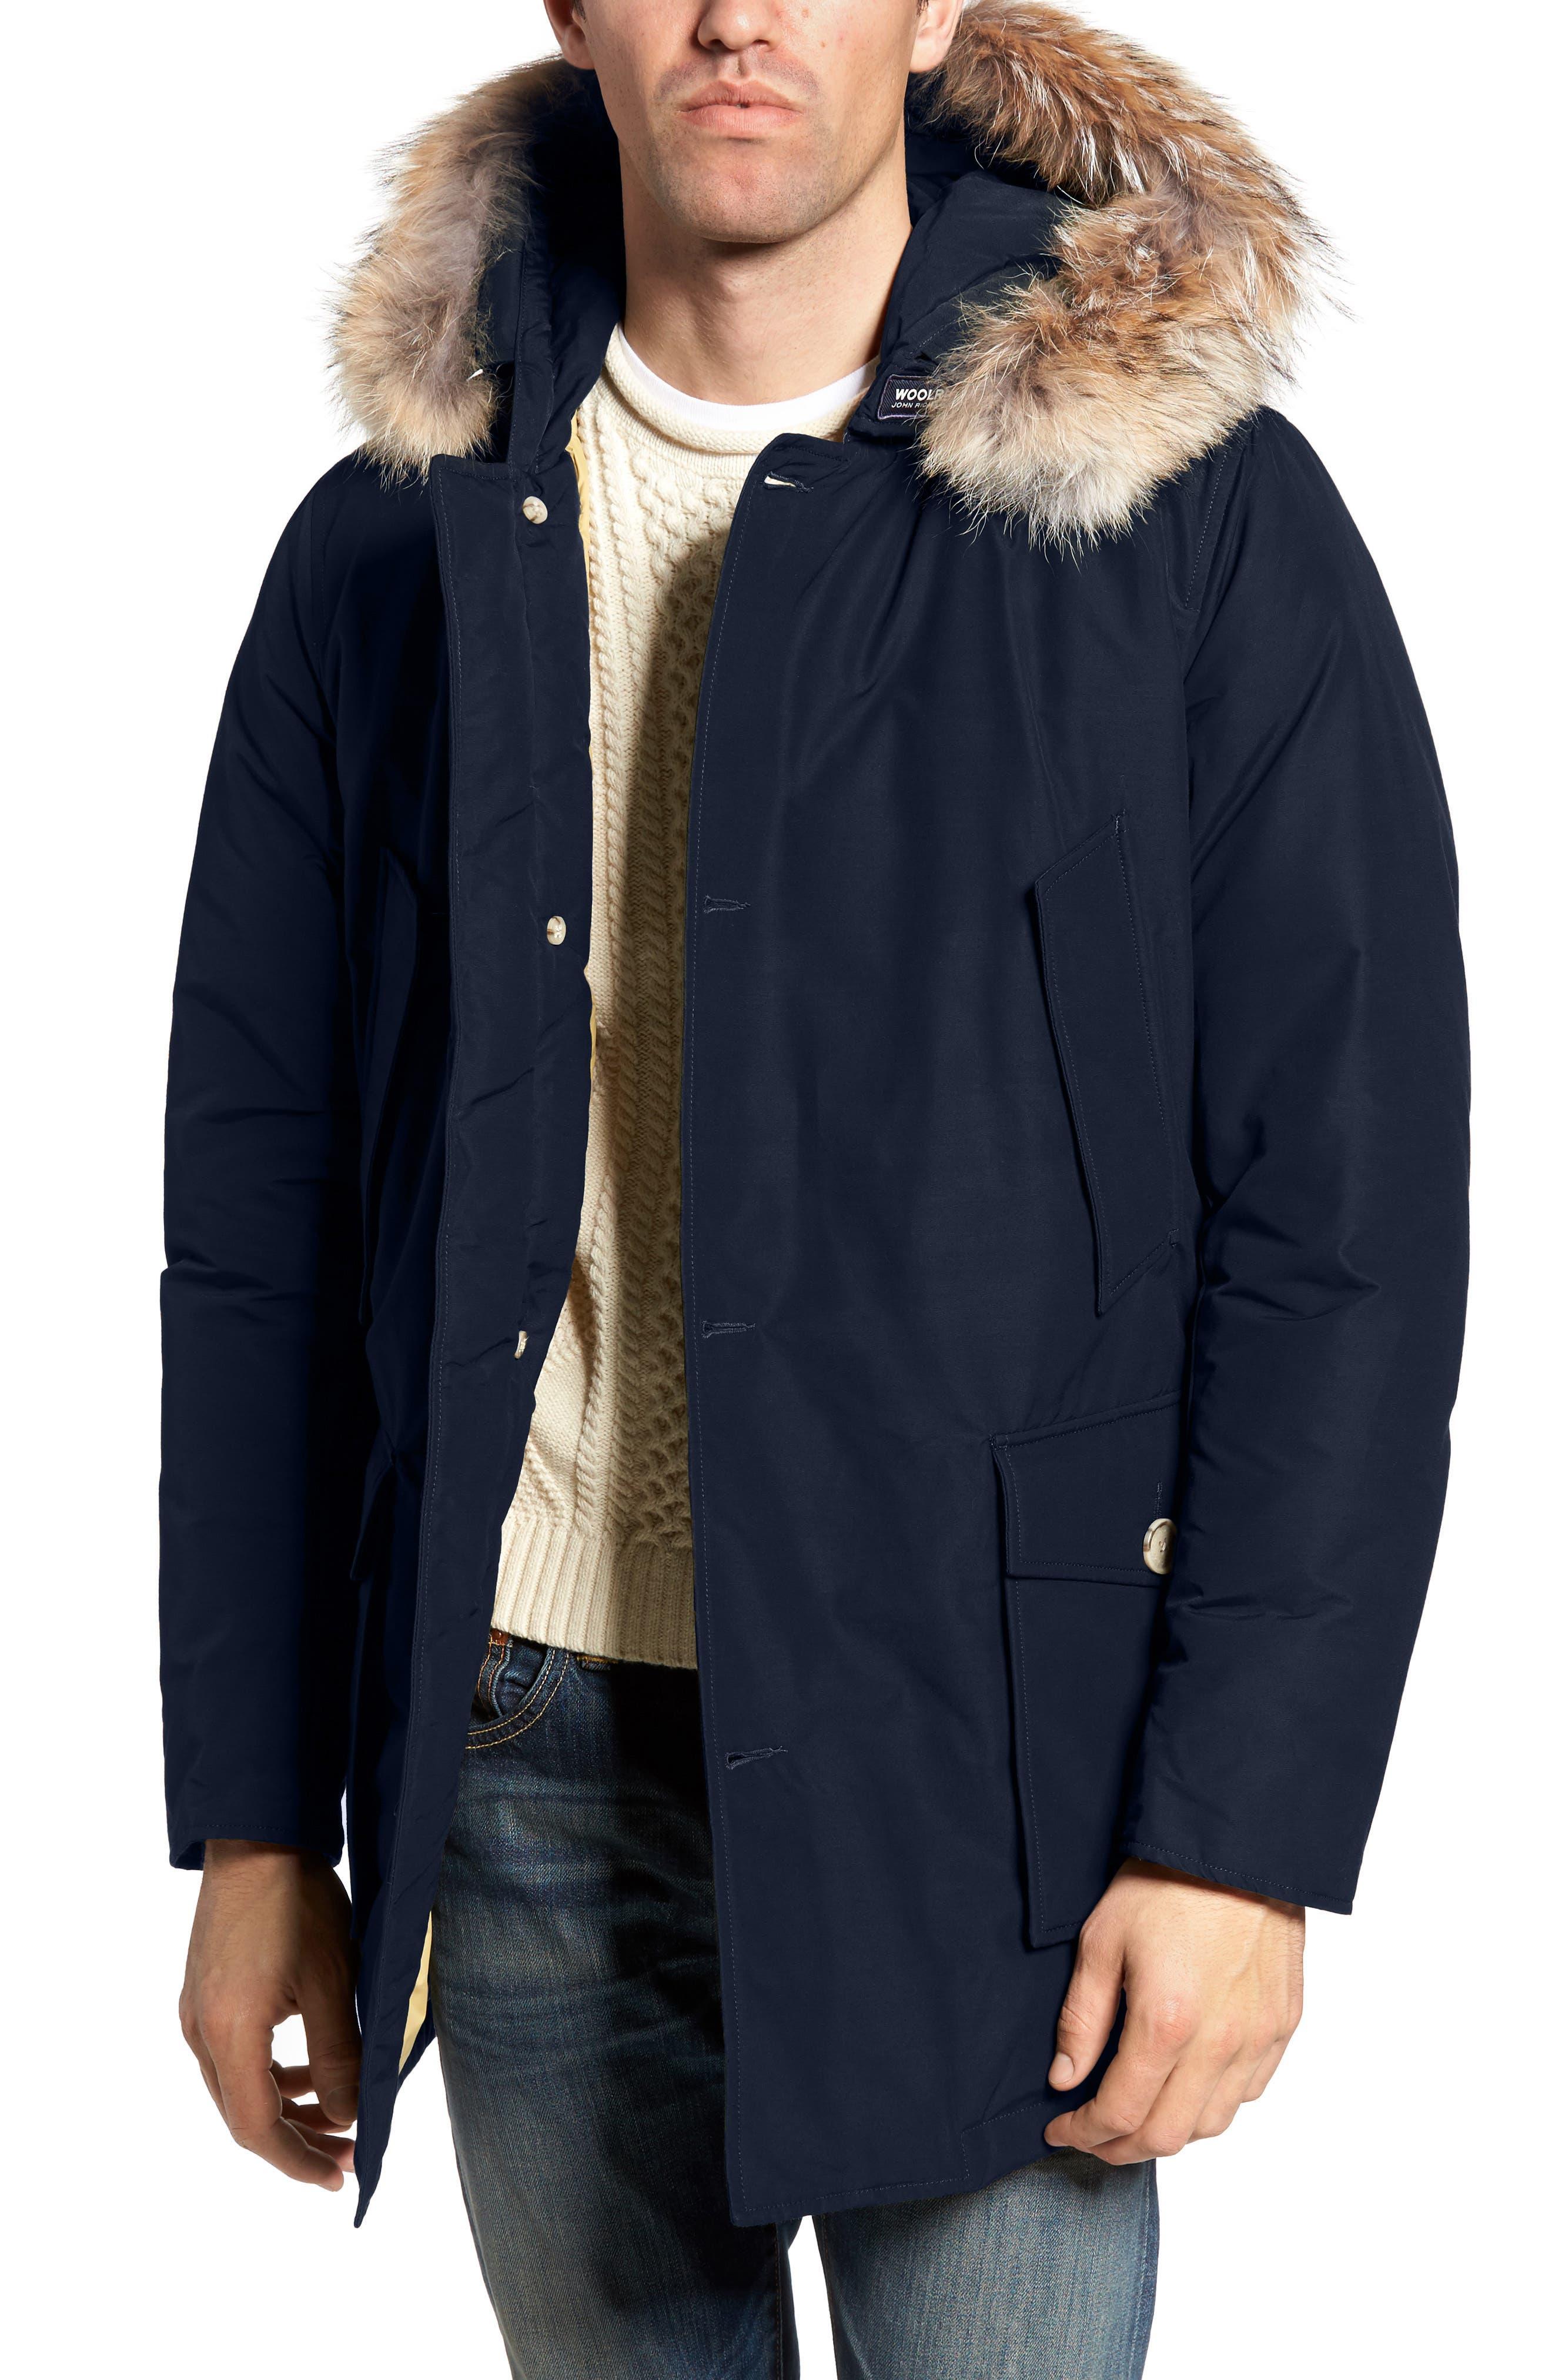 Woolrich John Rich & Bros. Arctic Parka with Genuine Coyote Fur Trim